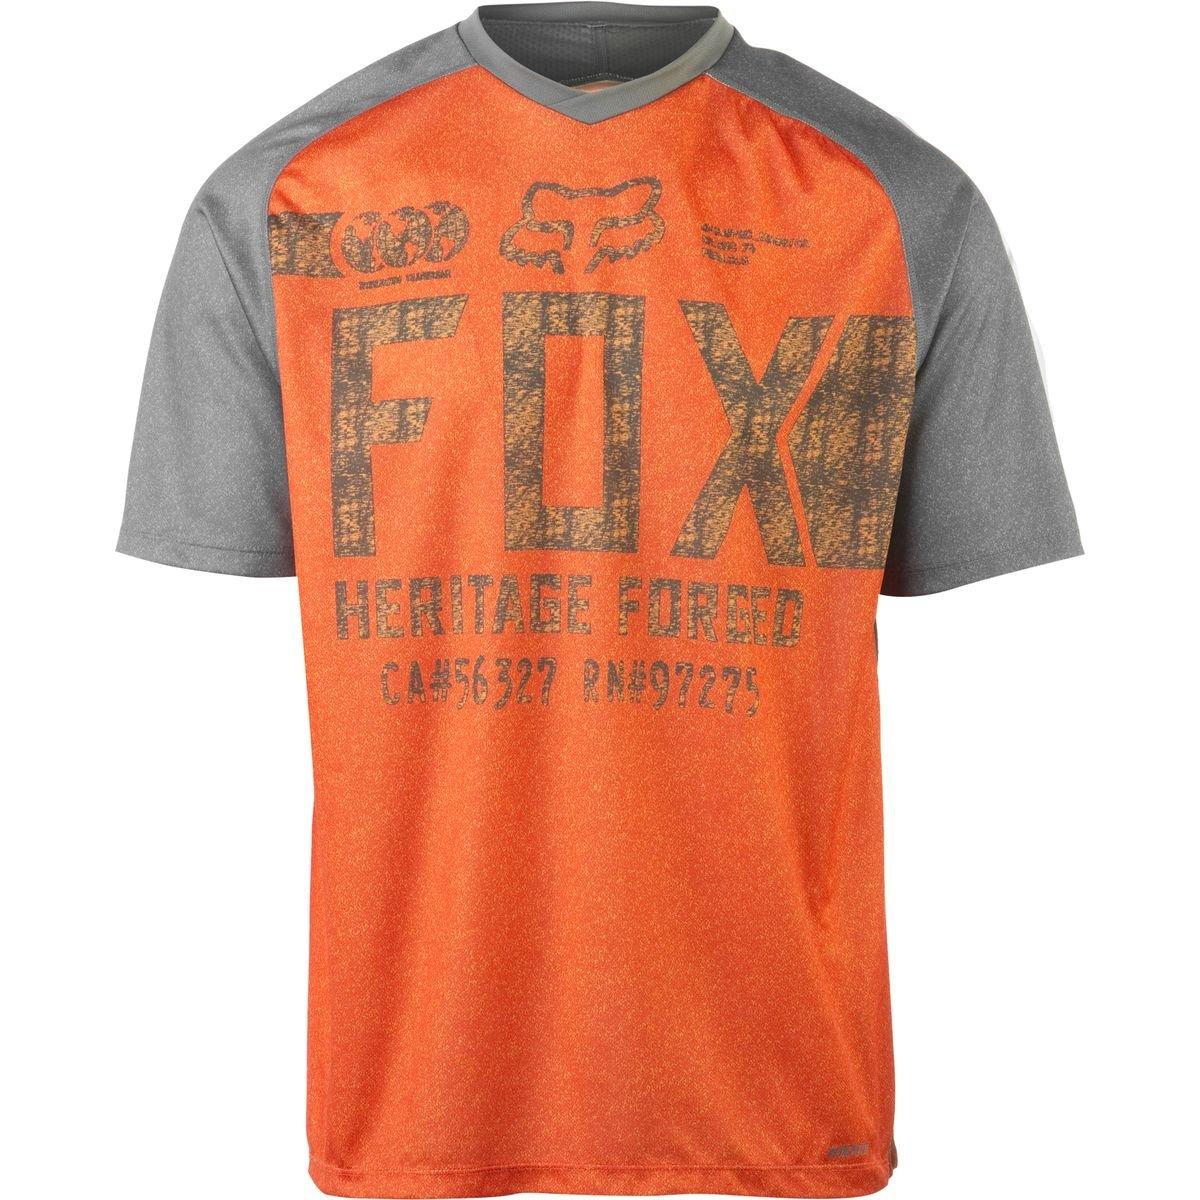 Fox Racing Indicator Limited Edition Jersey - Short Sleeve - Men's Charcoal/Orange, XL